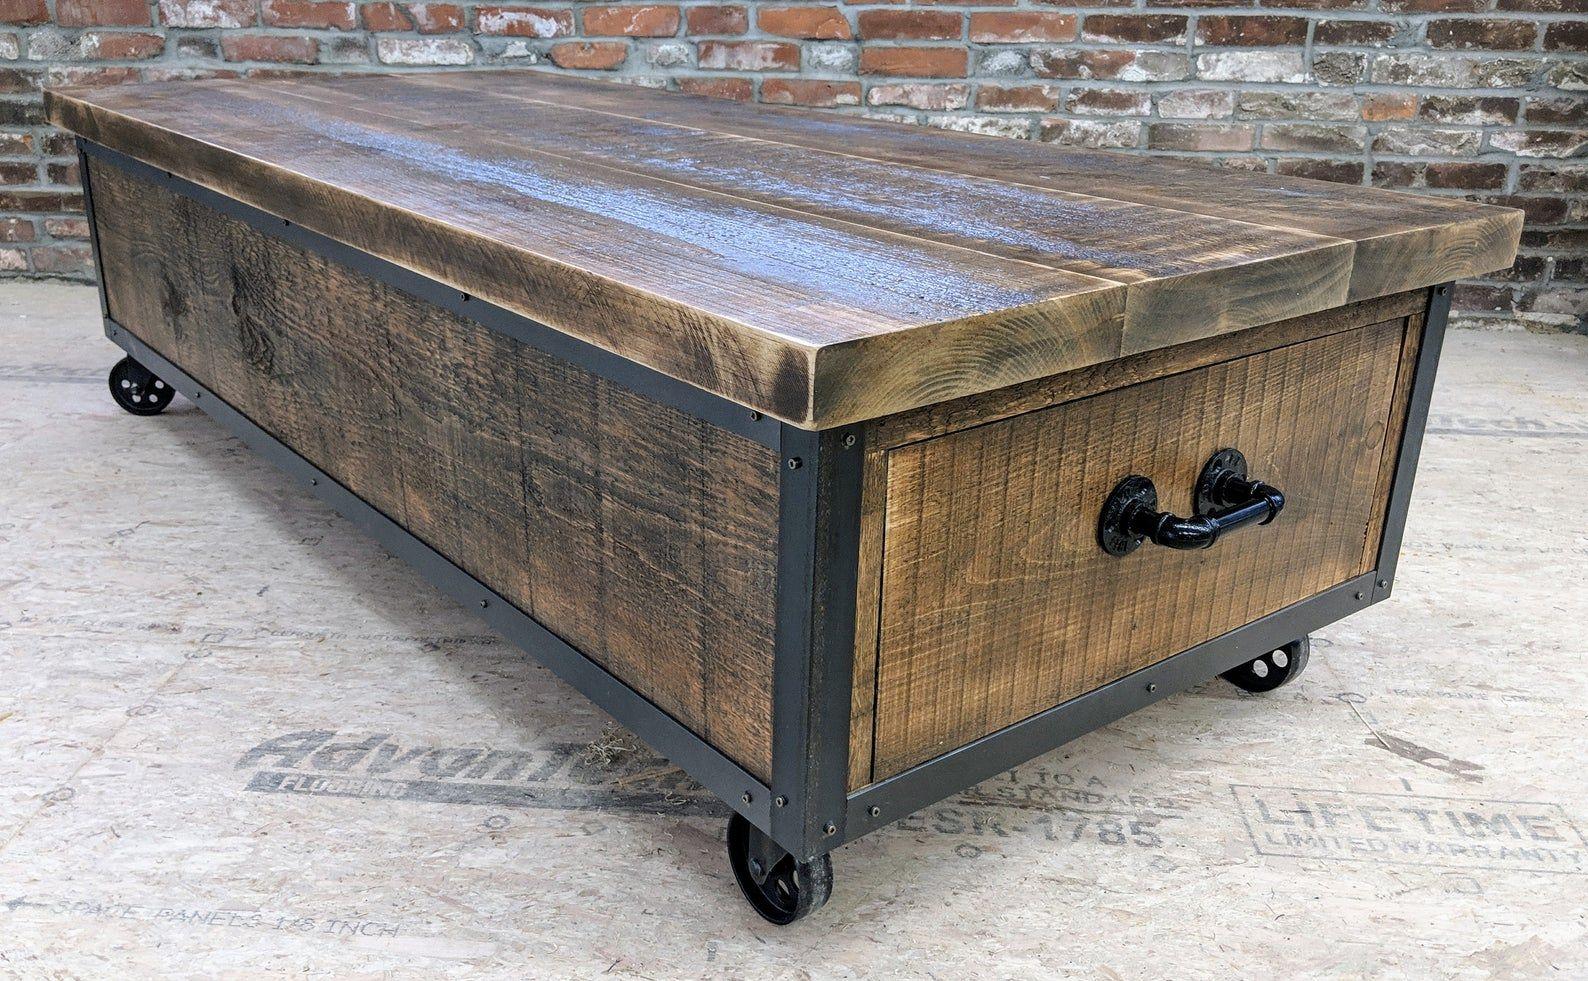 Rustic Industrial Barn Wood Board Coffee Table Extra Long In 2021 Coffee Table Farmhouse Diy Farmhouse Coffee Table Rustic Industrial [ 981 x 1588 Pixel ]